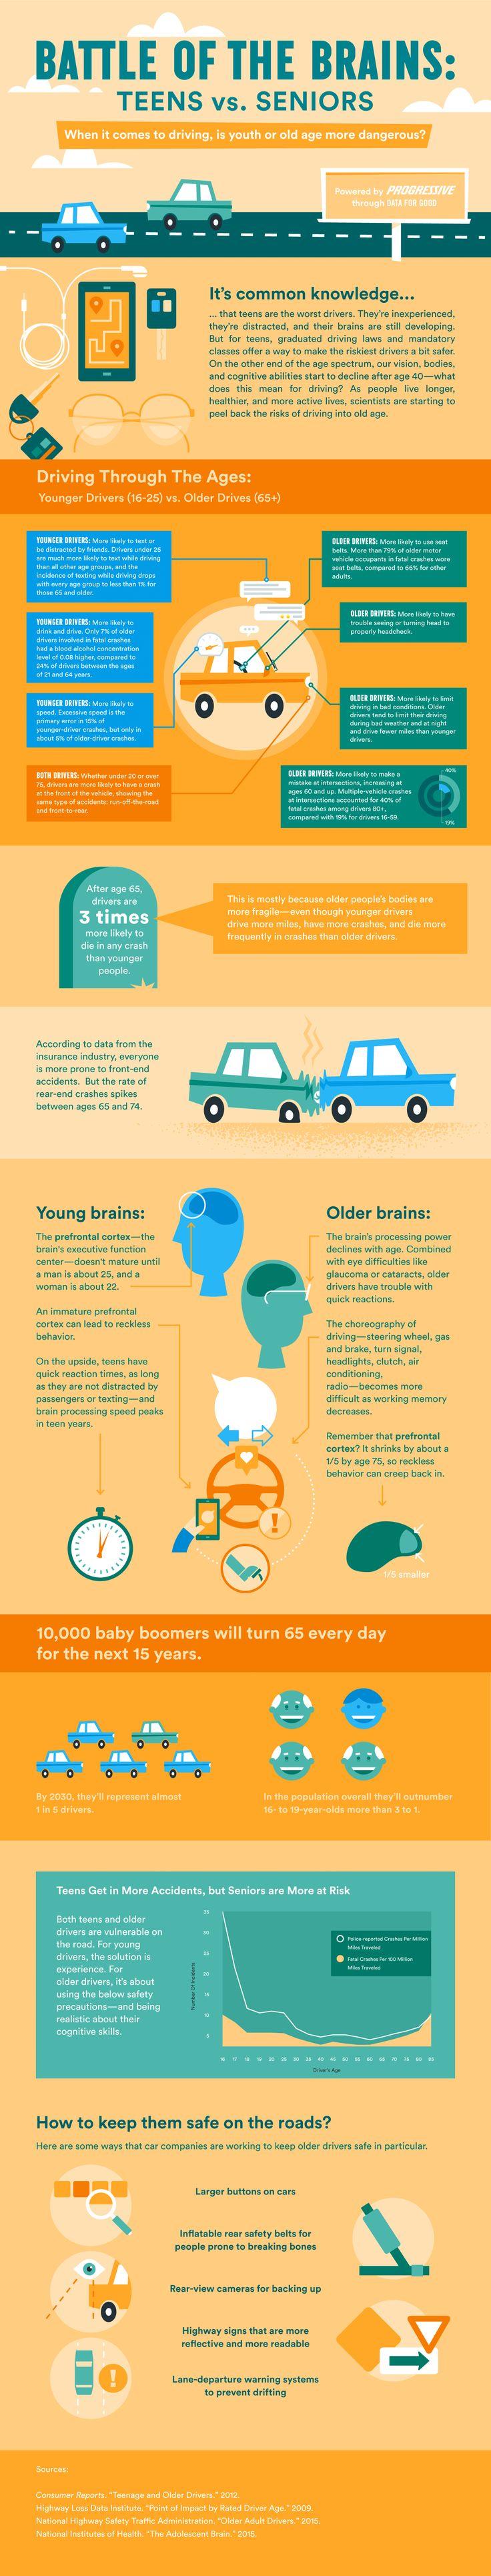 Teens vs. Seniors: Who's More Dangerous On The Road?